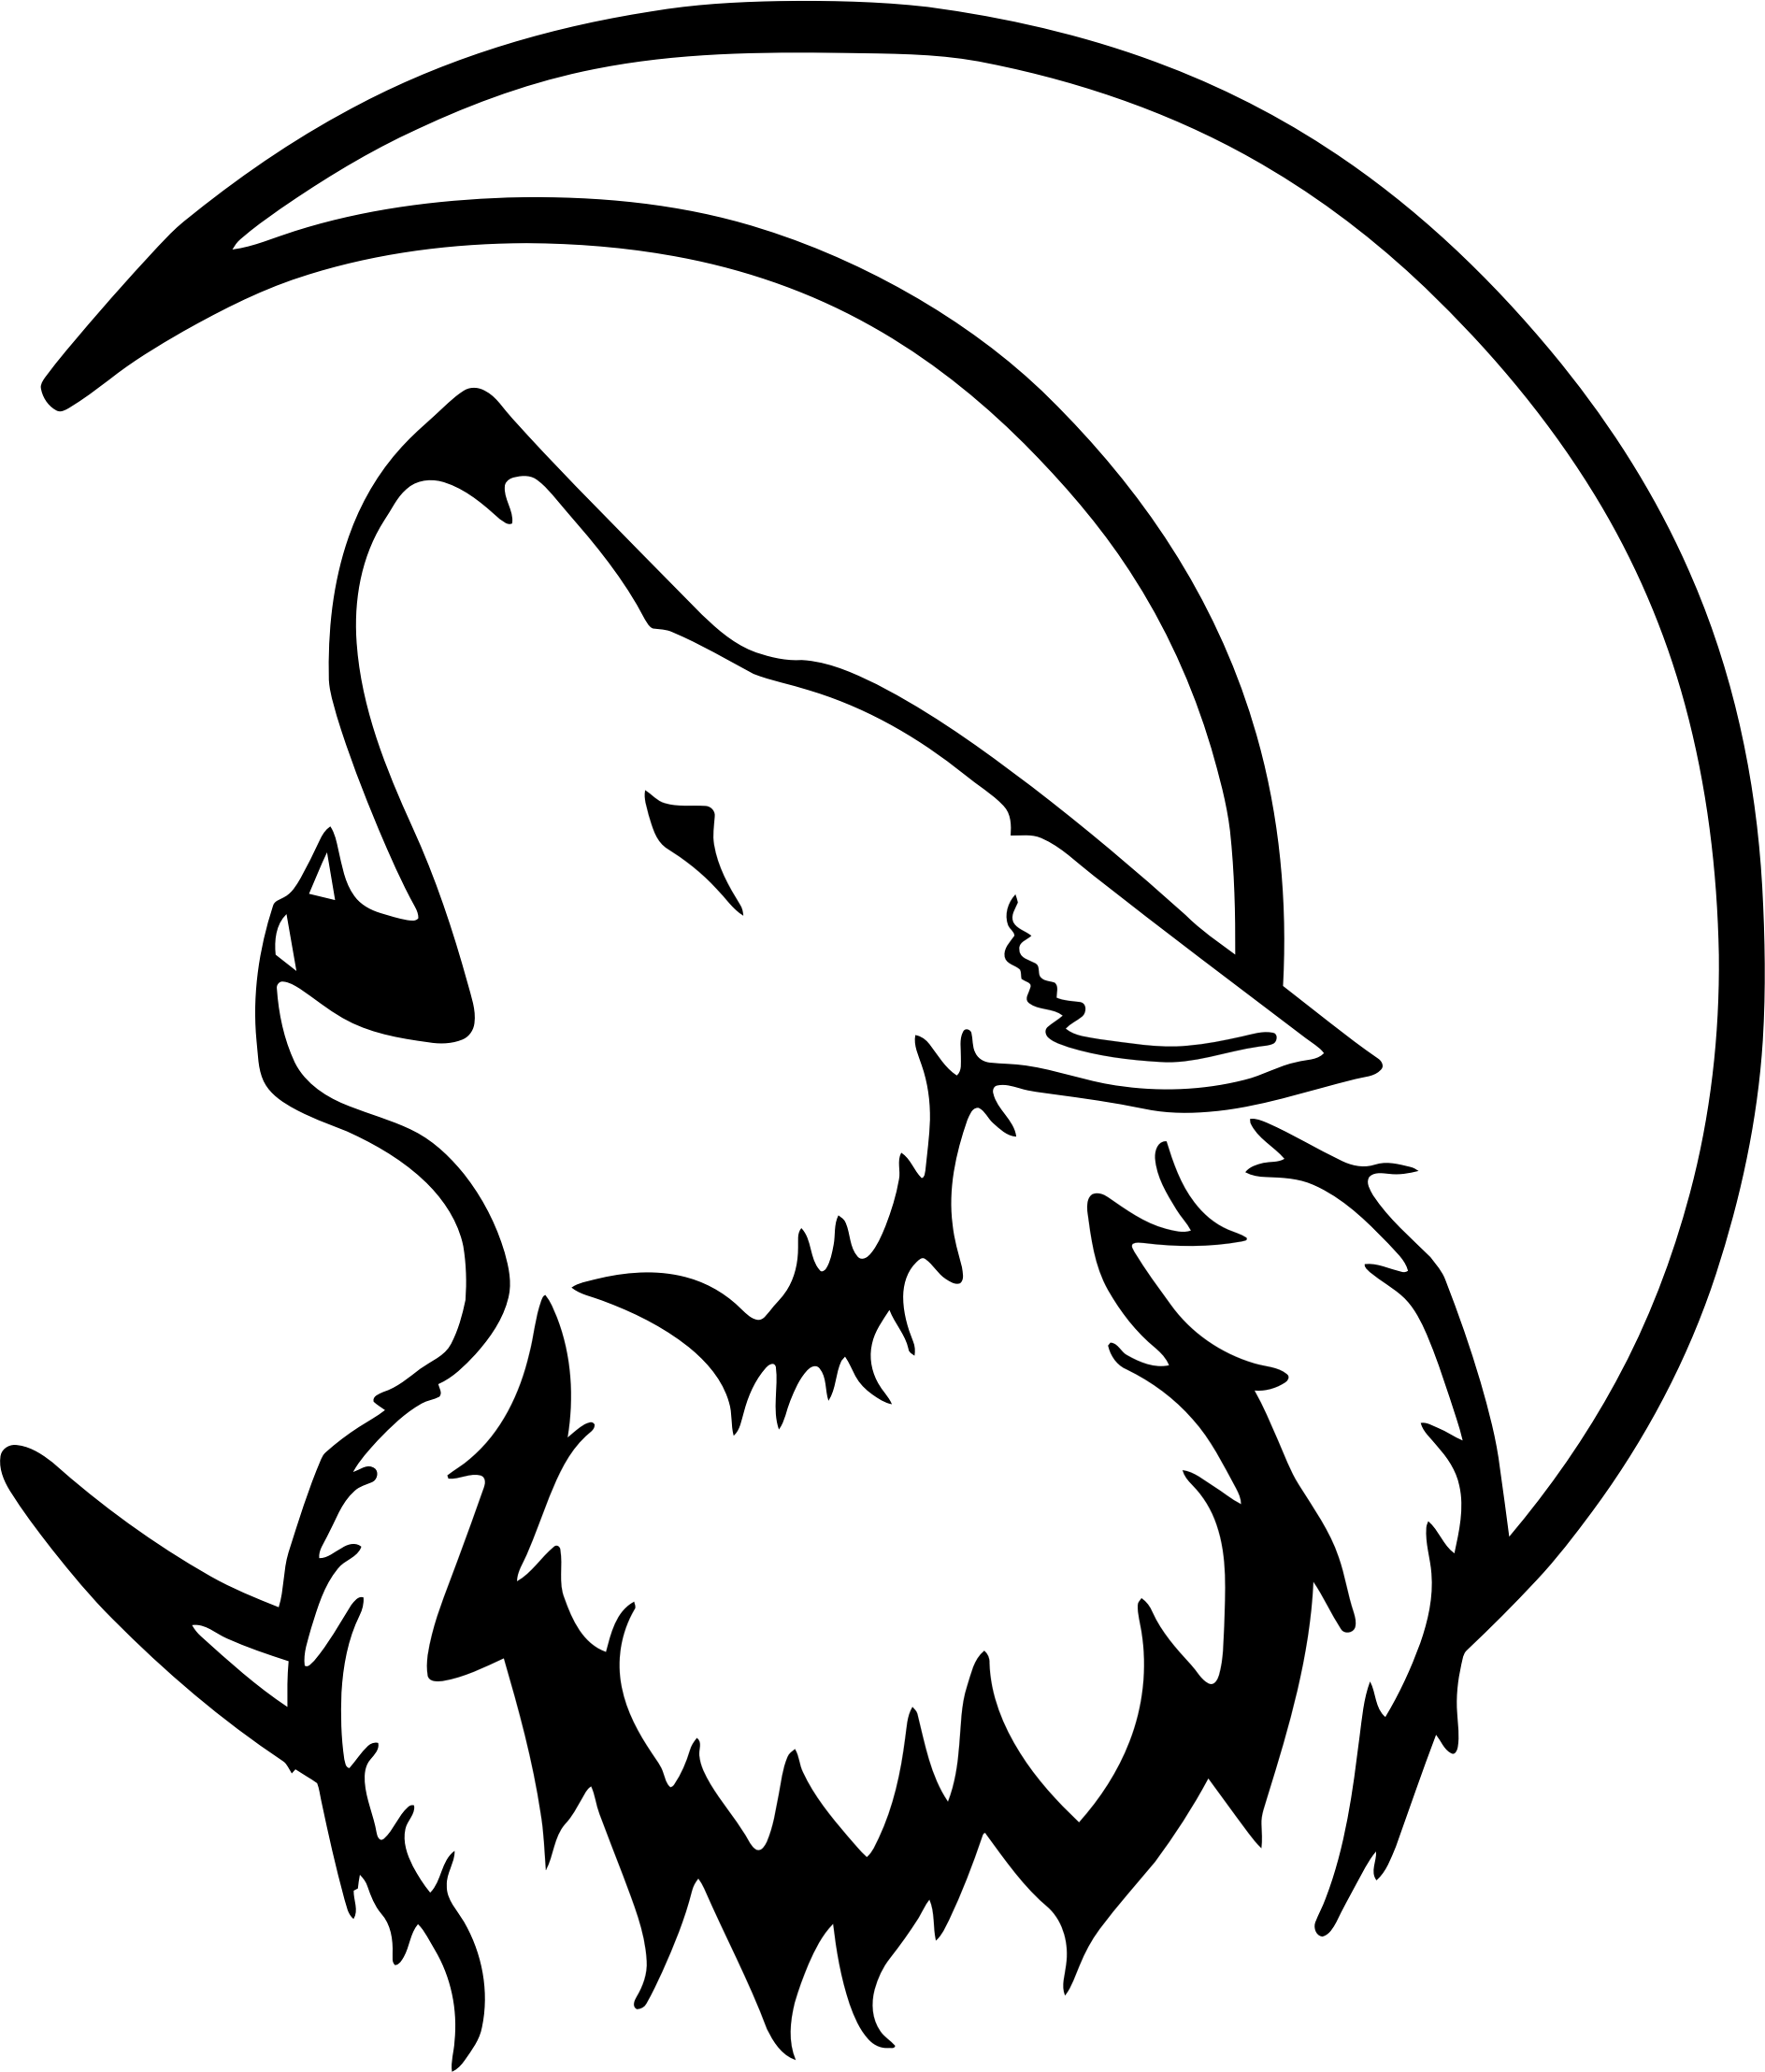 Internetwebgallerycom Stun Stunguncircuitschematicsdiagramshtml